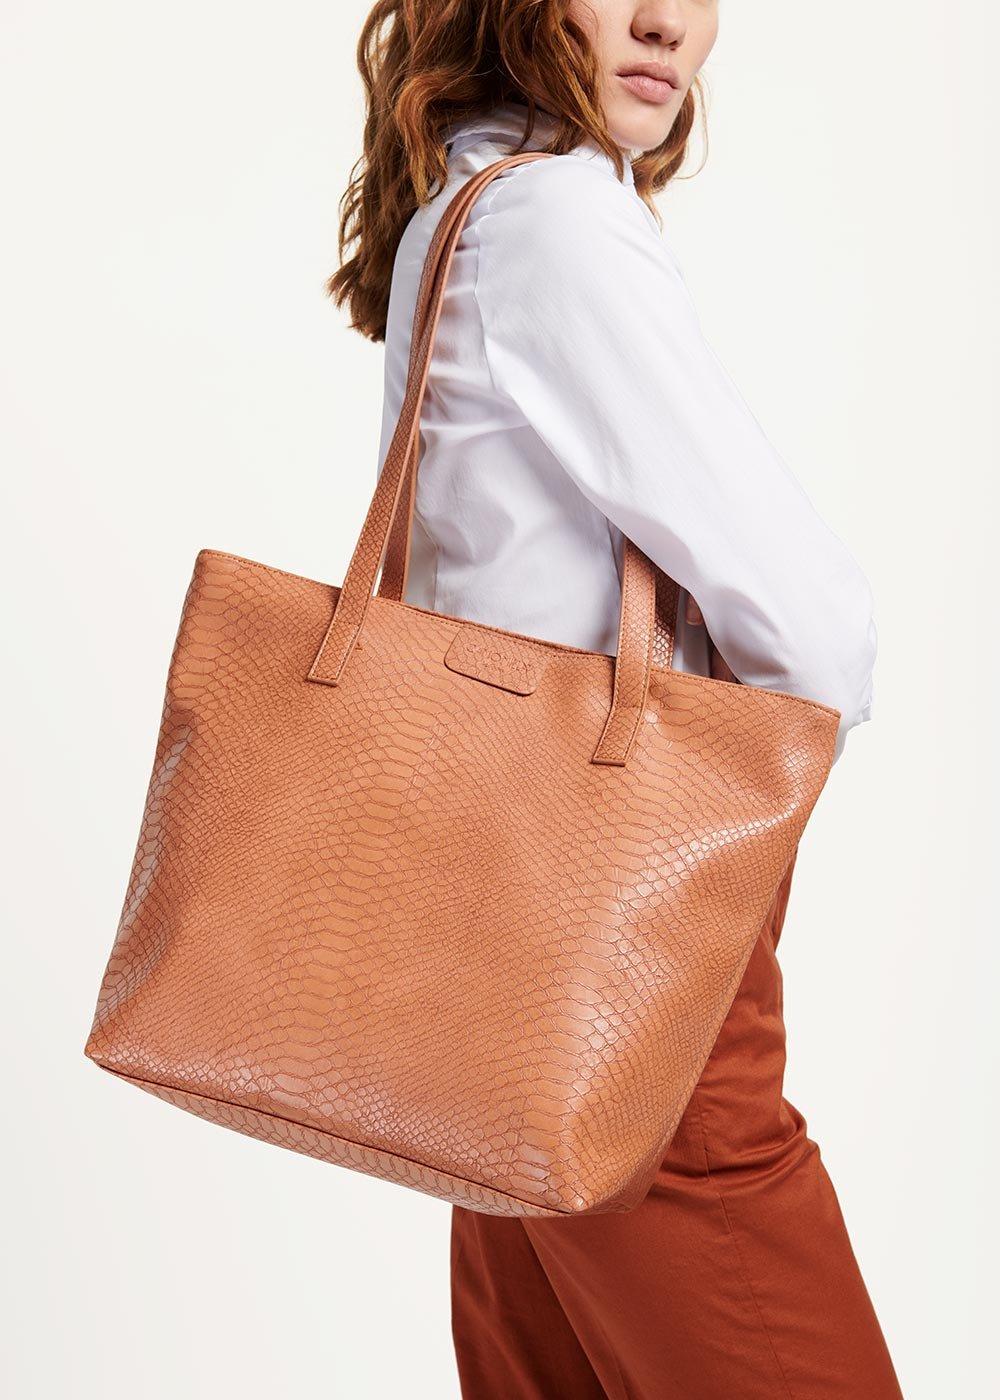 Badia shopping bag